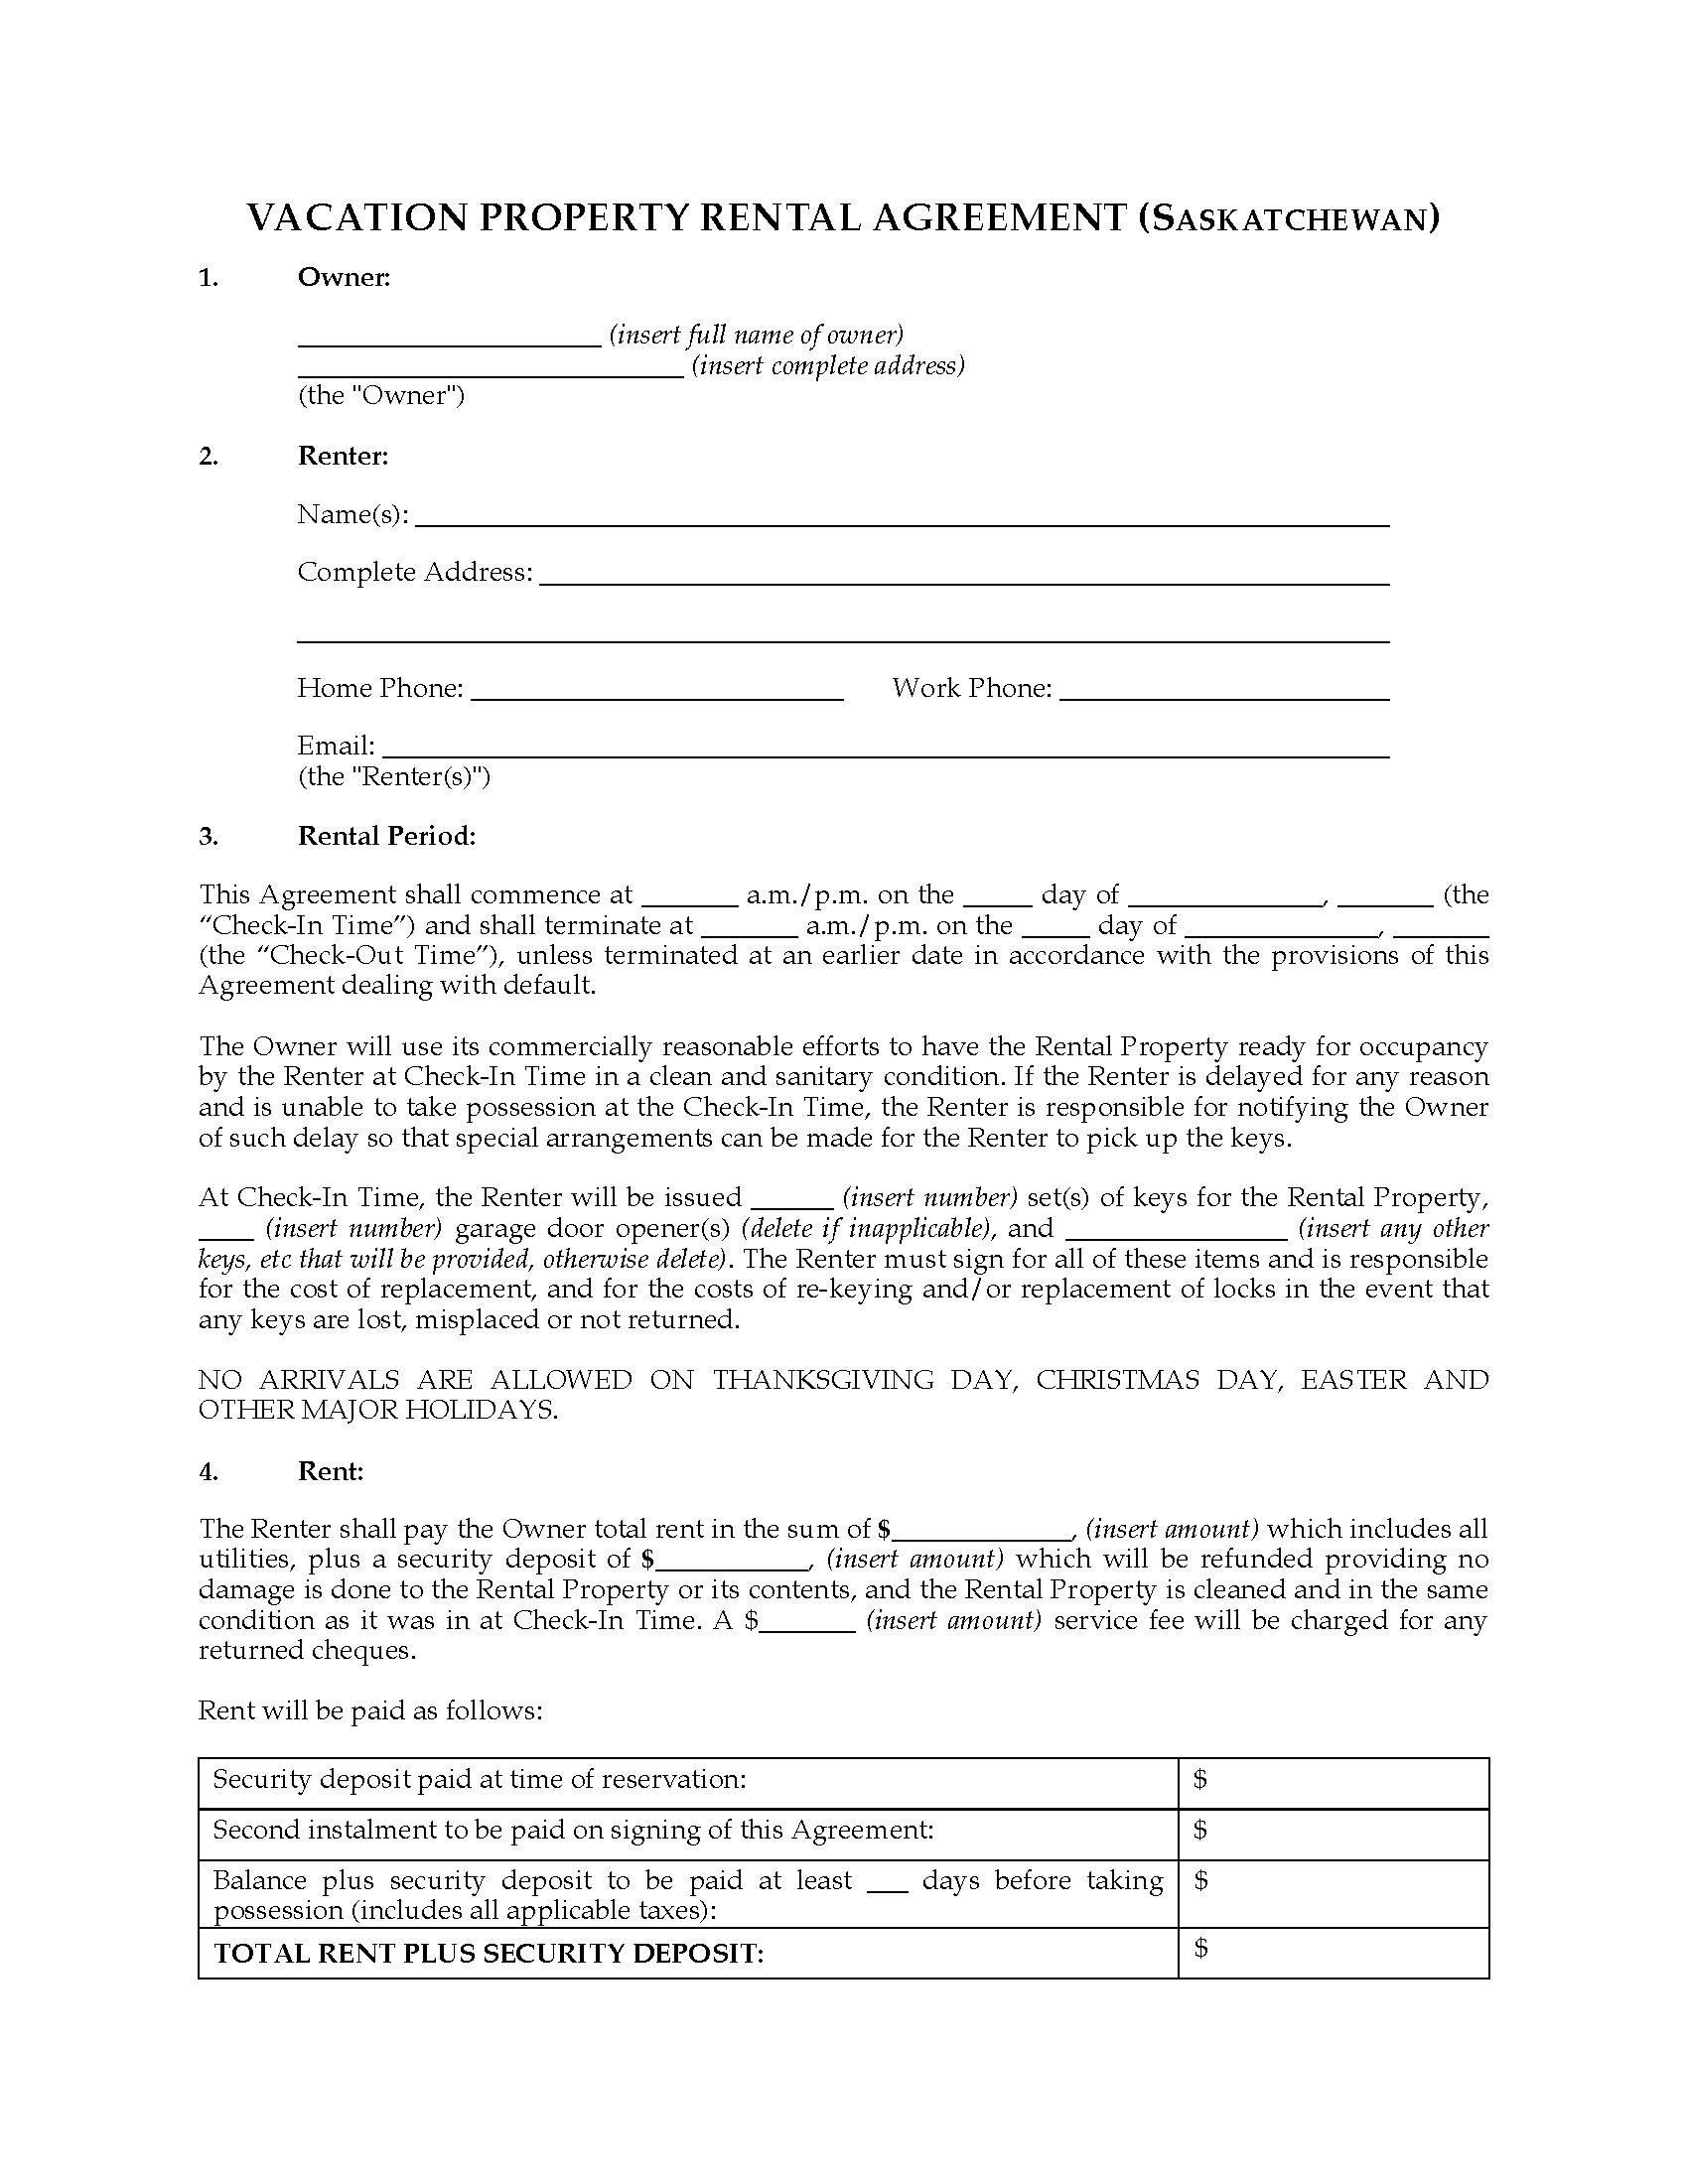 Room Rental Agreement Template Saskatchewan